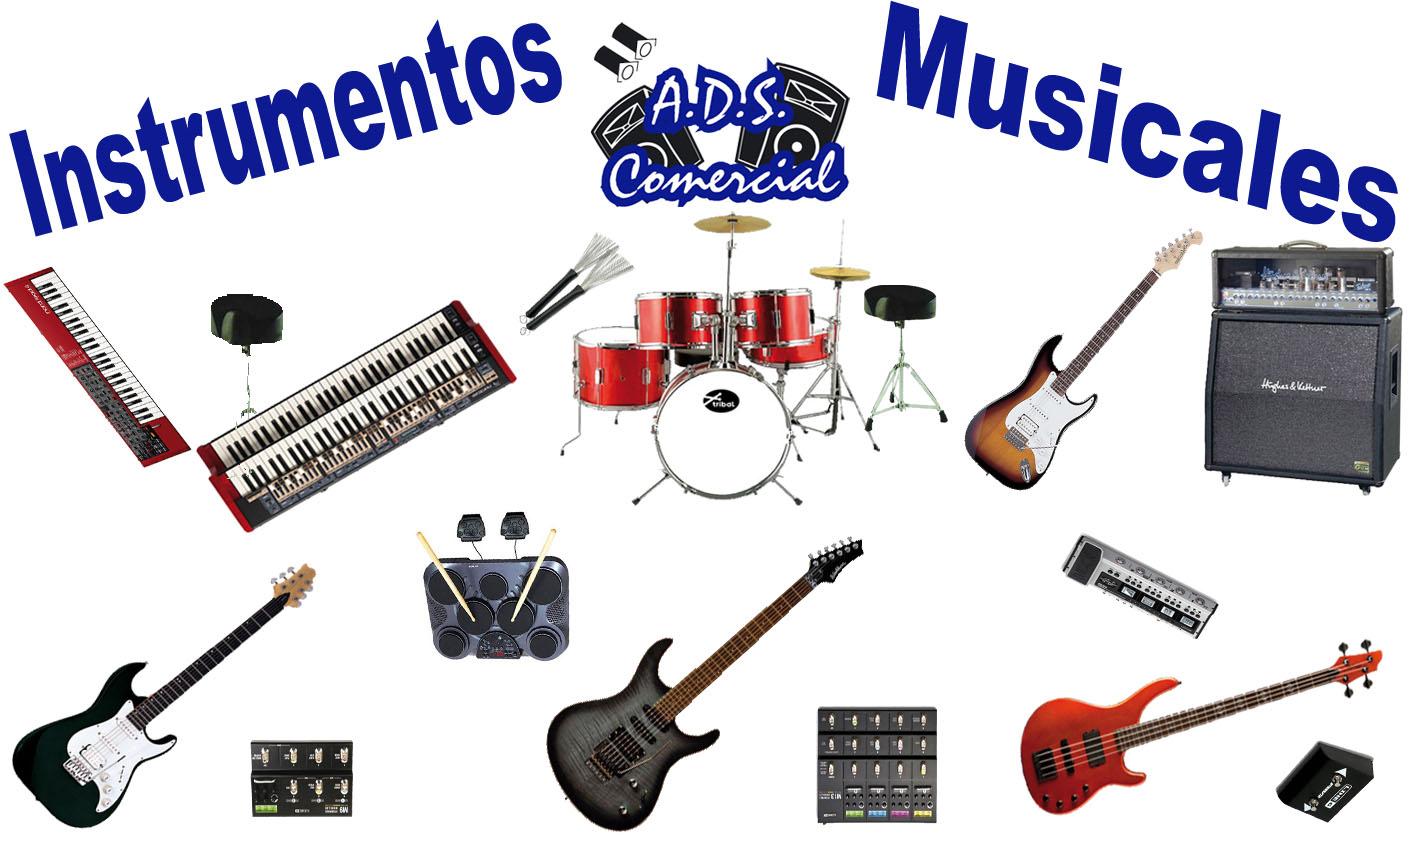 InstrumentosMusicales_ADSComercial.jpg